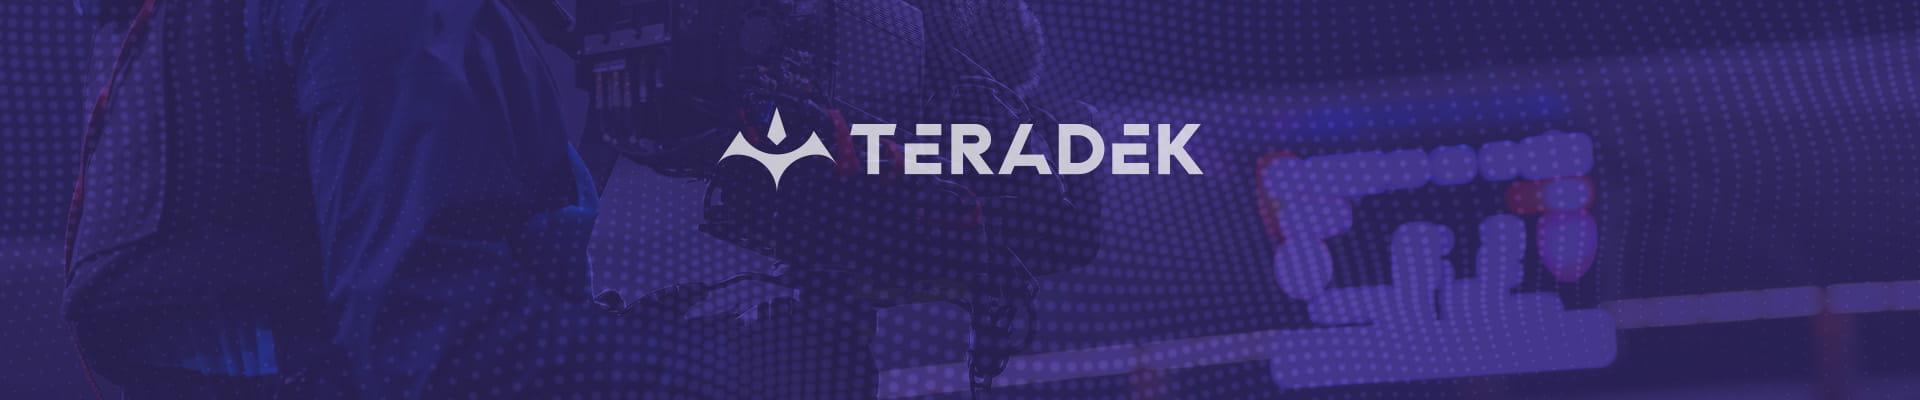 DPSJ | Teradek Cube 正規販売店